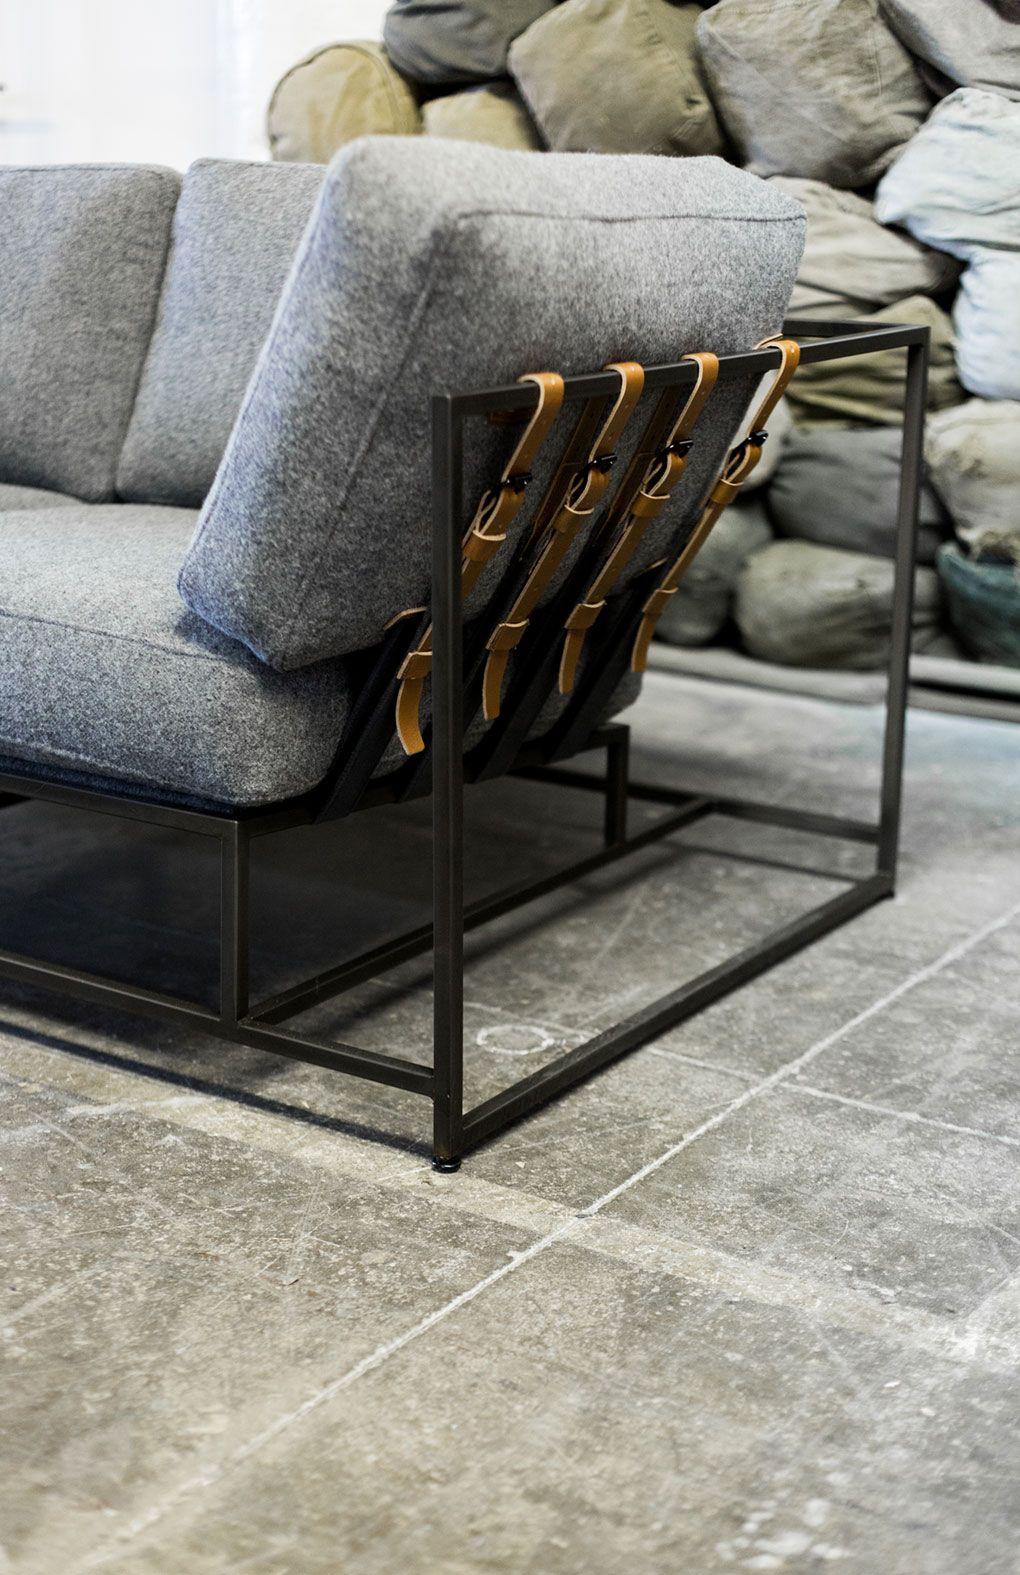 Charmant Furniture In Studio Of Designer Stephen Kenn.